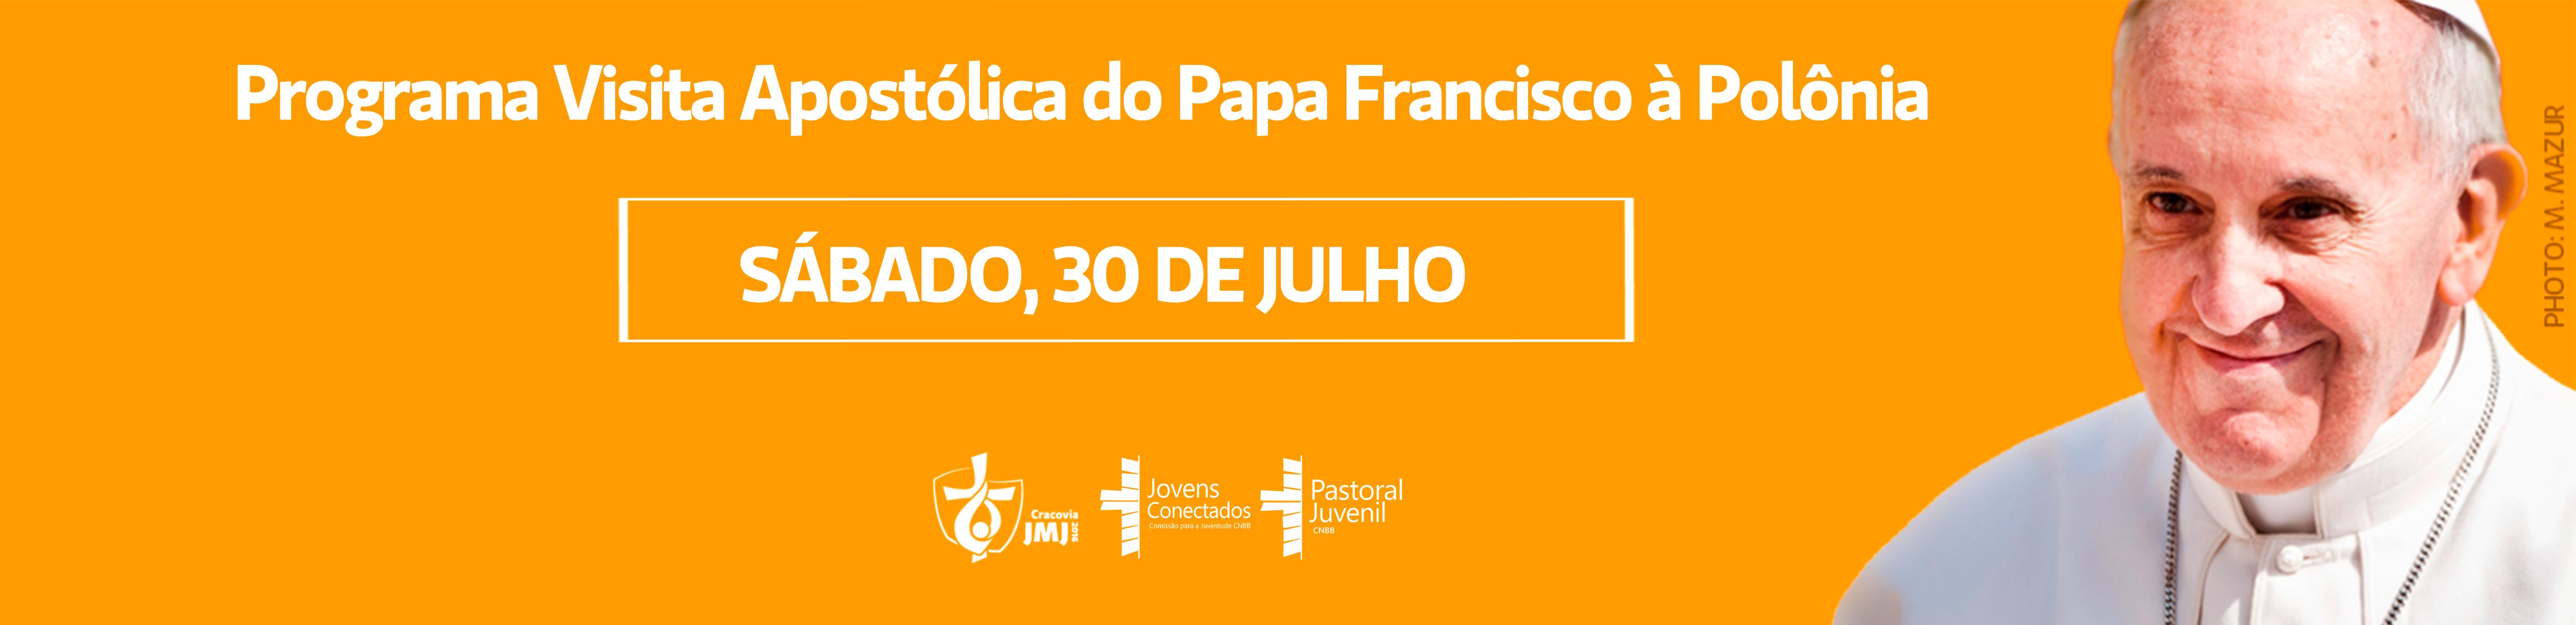 Sábado-30-de-julho---Papa-JMJ